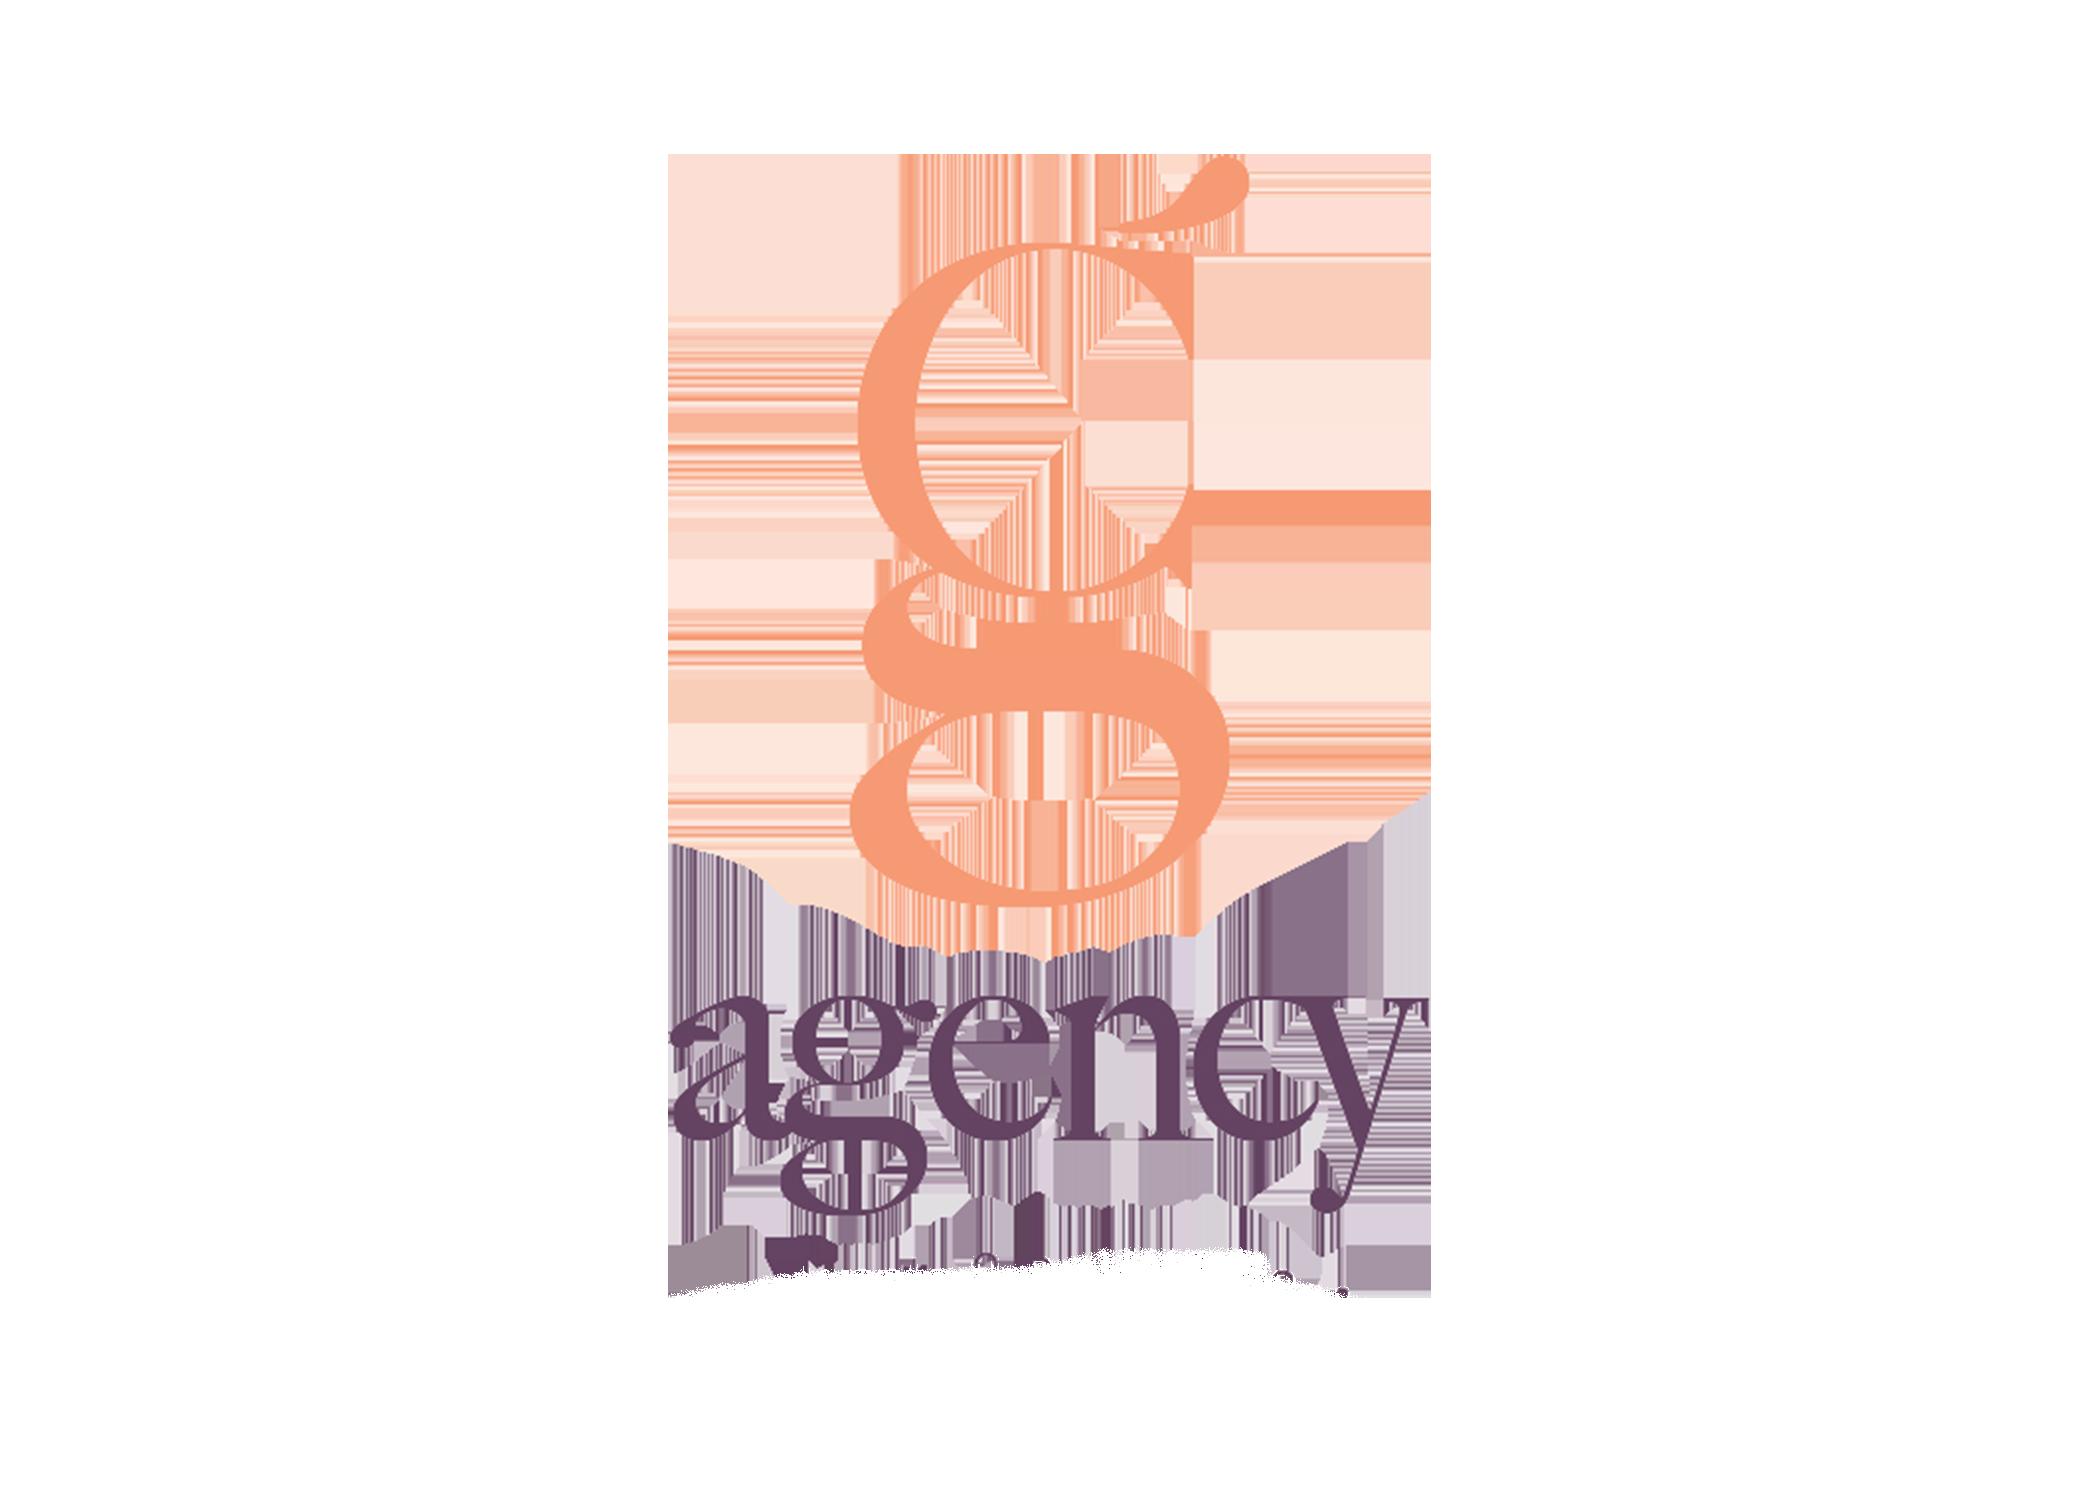 CG Agency